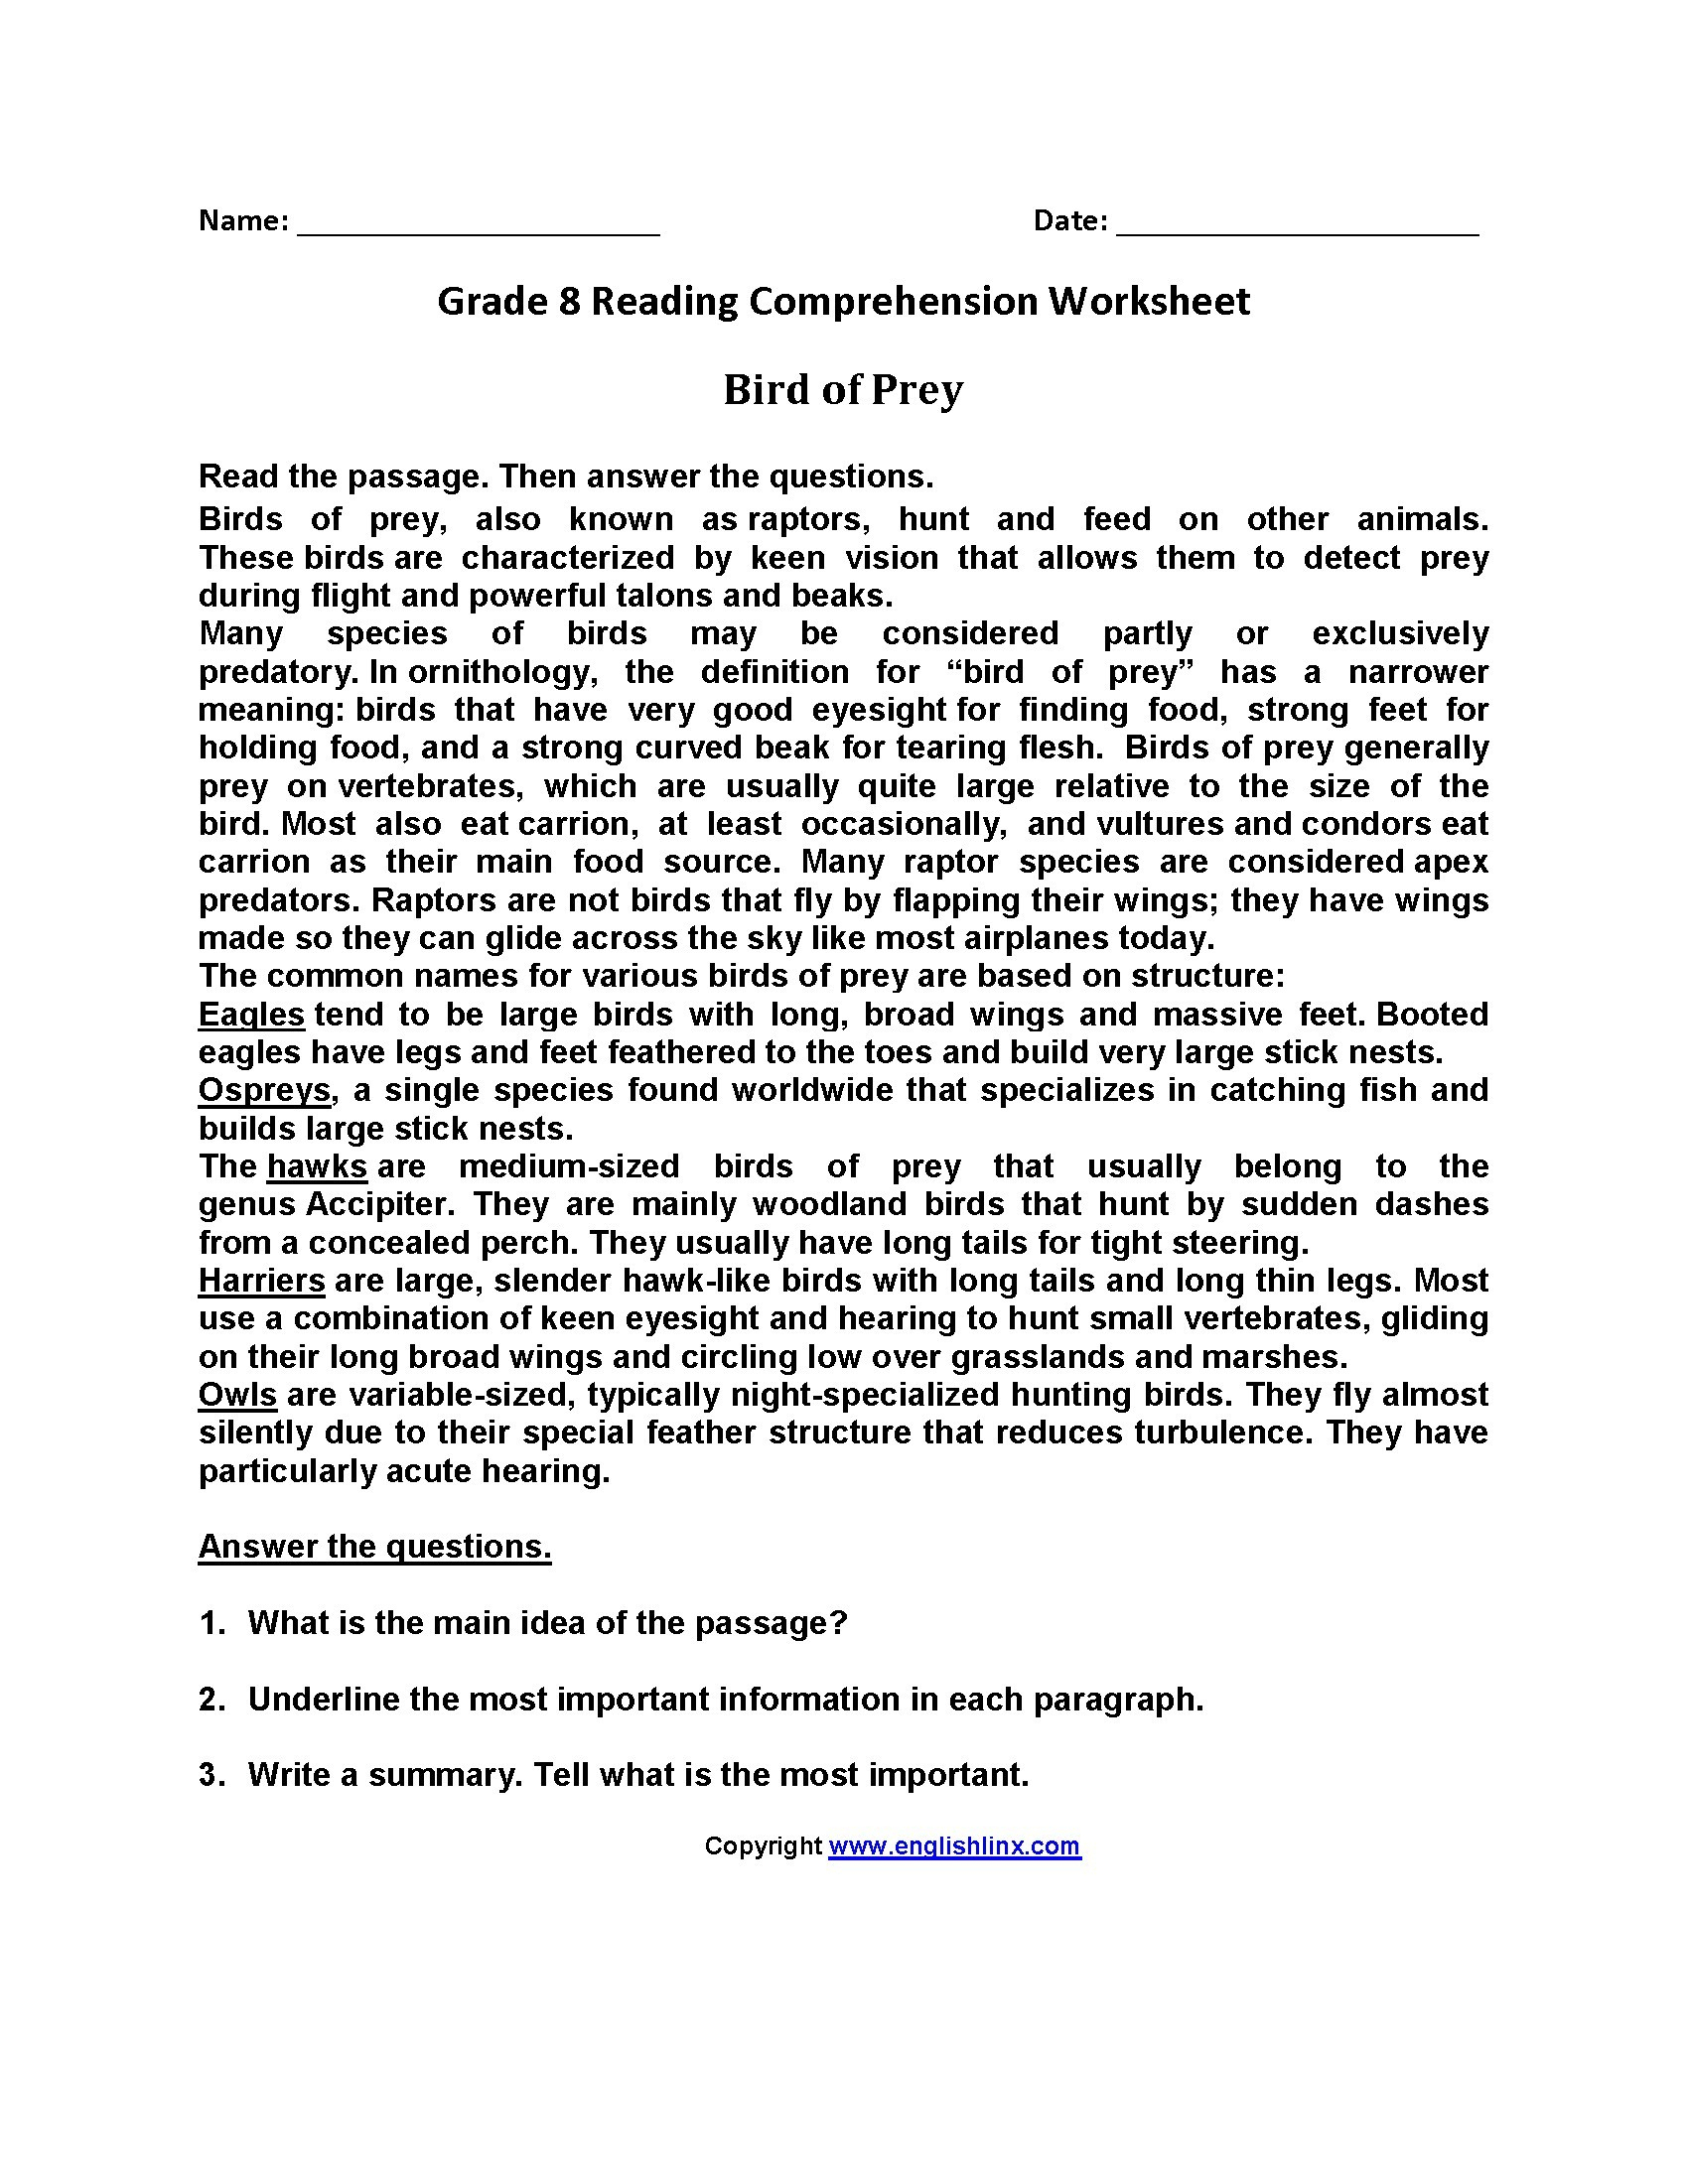 Worksheet : Free Printable Reading Comprehension Worksheets For 3Rd | Free Printable Reading Comprehension Worksheets For Adults